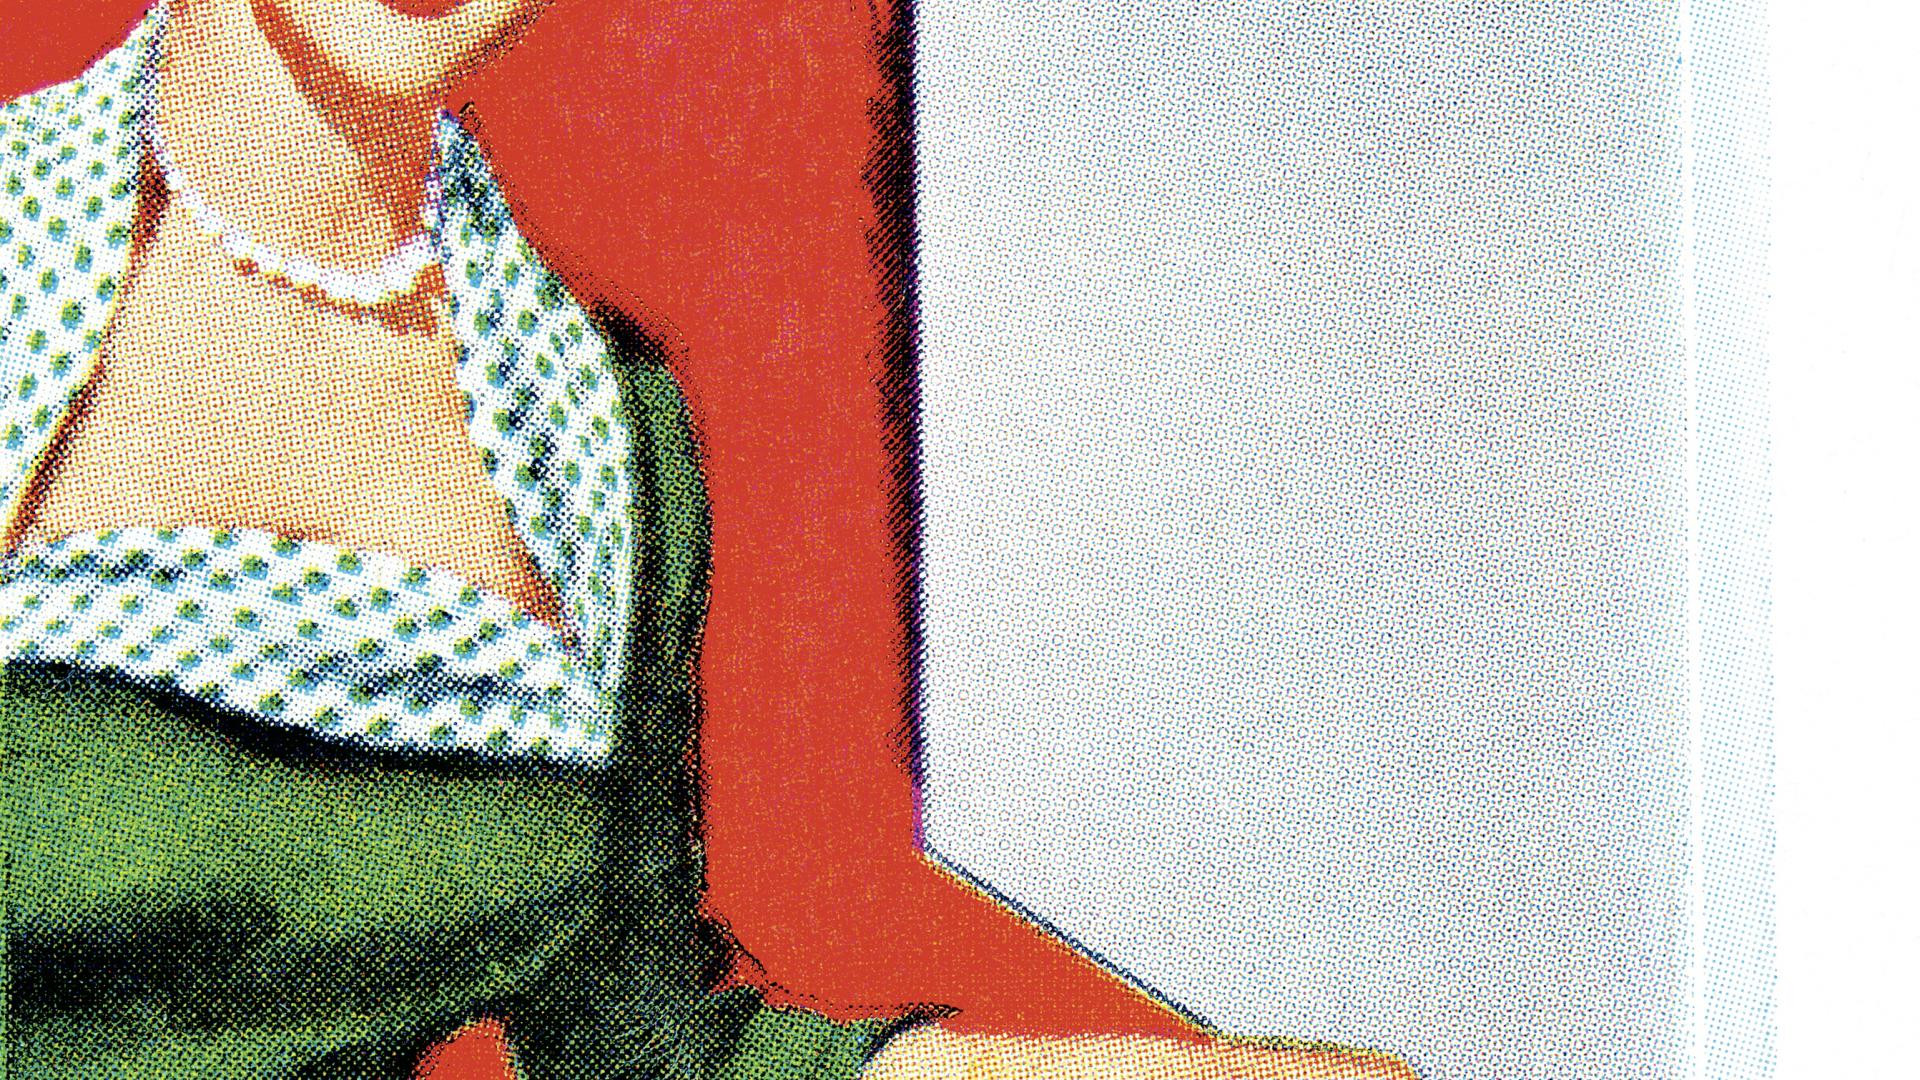 Frau Hausfrau mit Tablett 50er Jahre